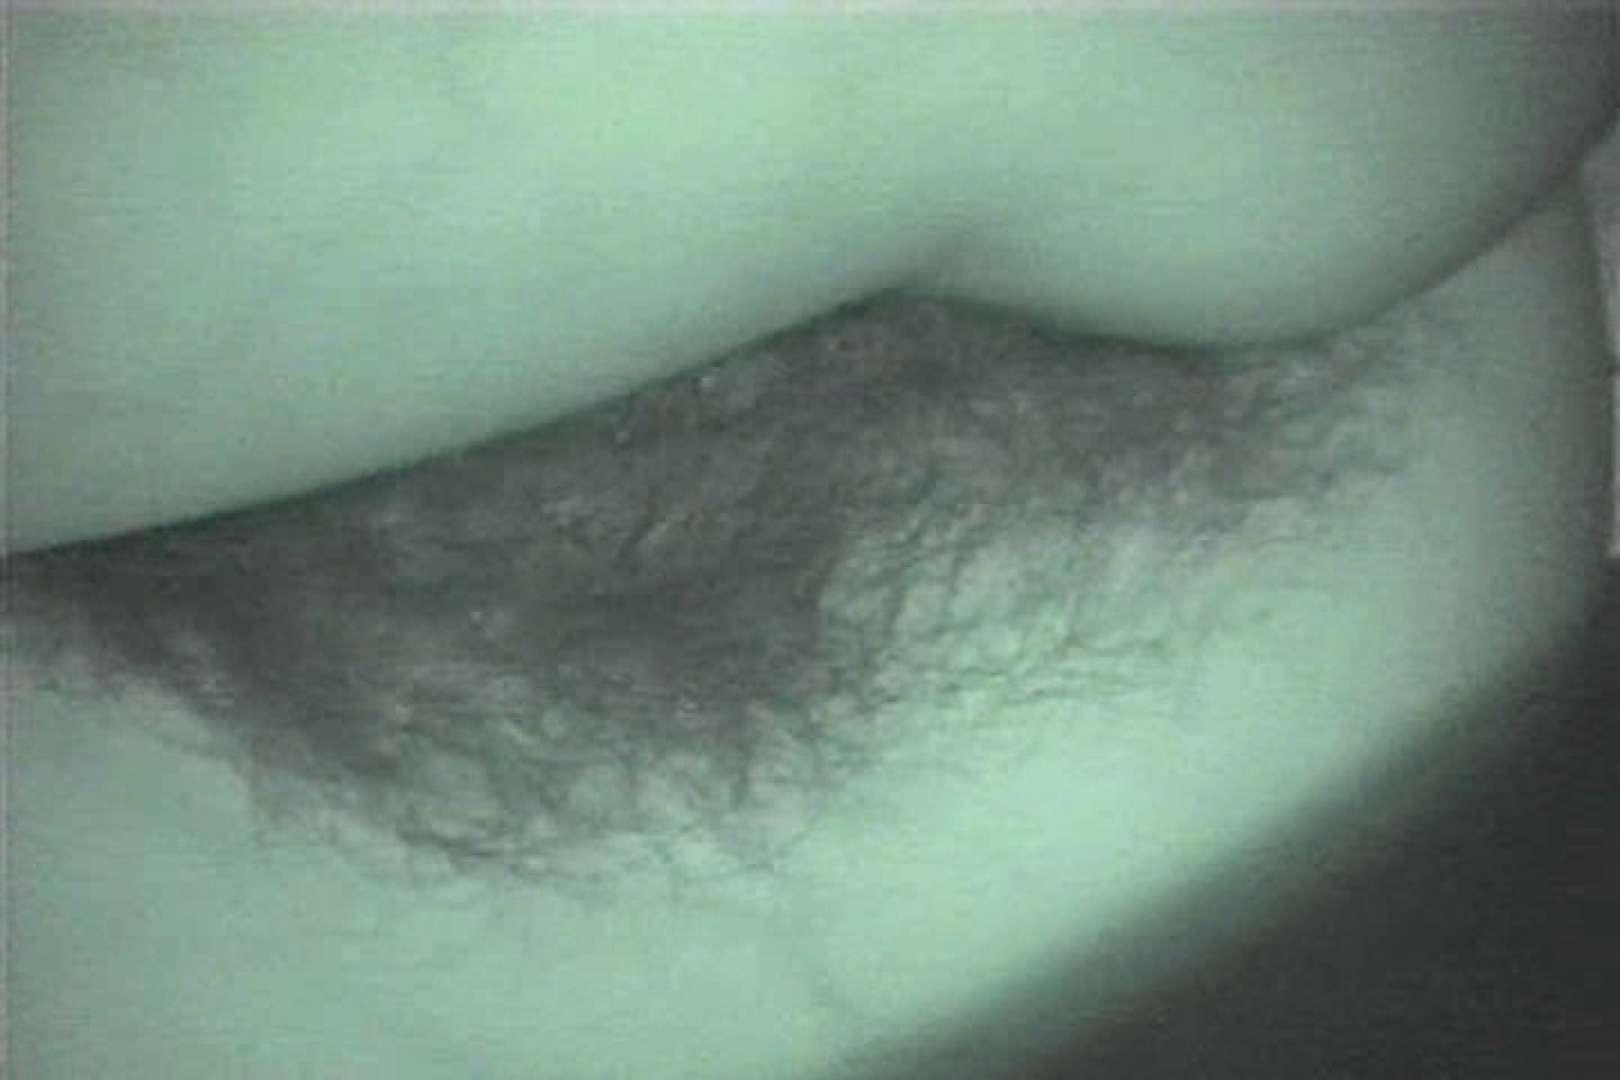 MASAさんの待ち伏せ撮り! 赤外線カーセックスVol.8 セックス流出映像 のぞき動画画像 99連発 31